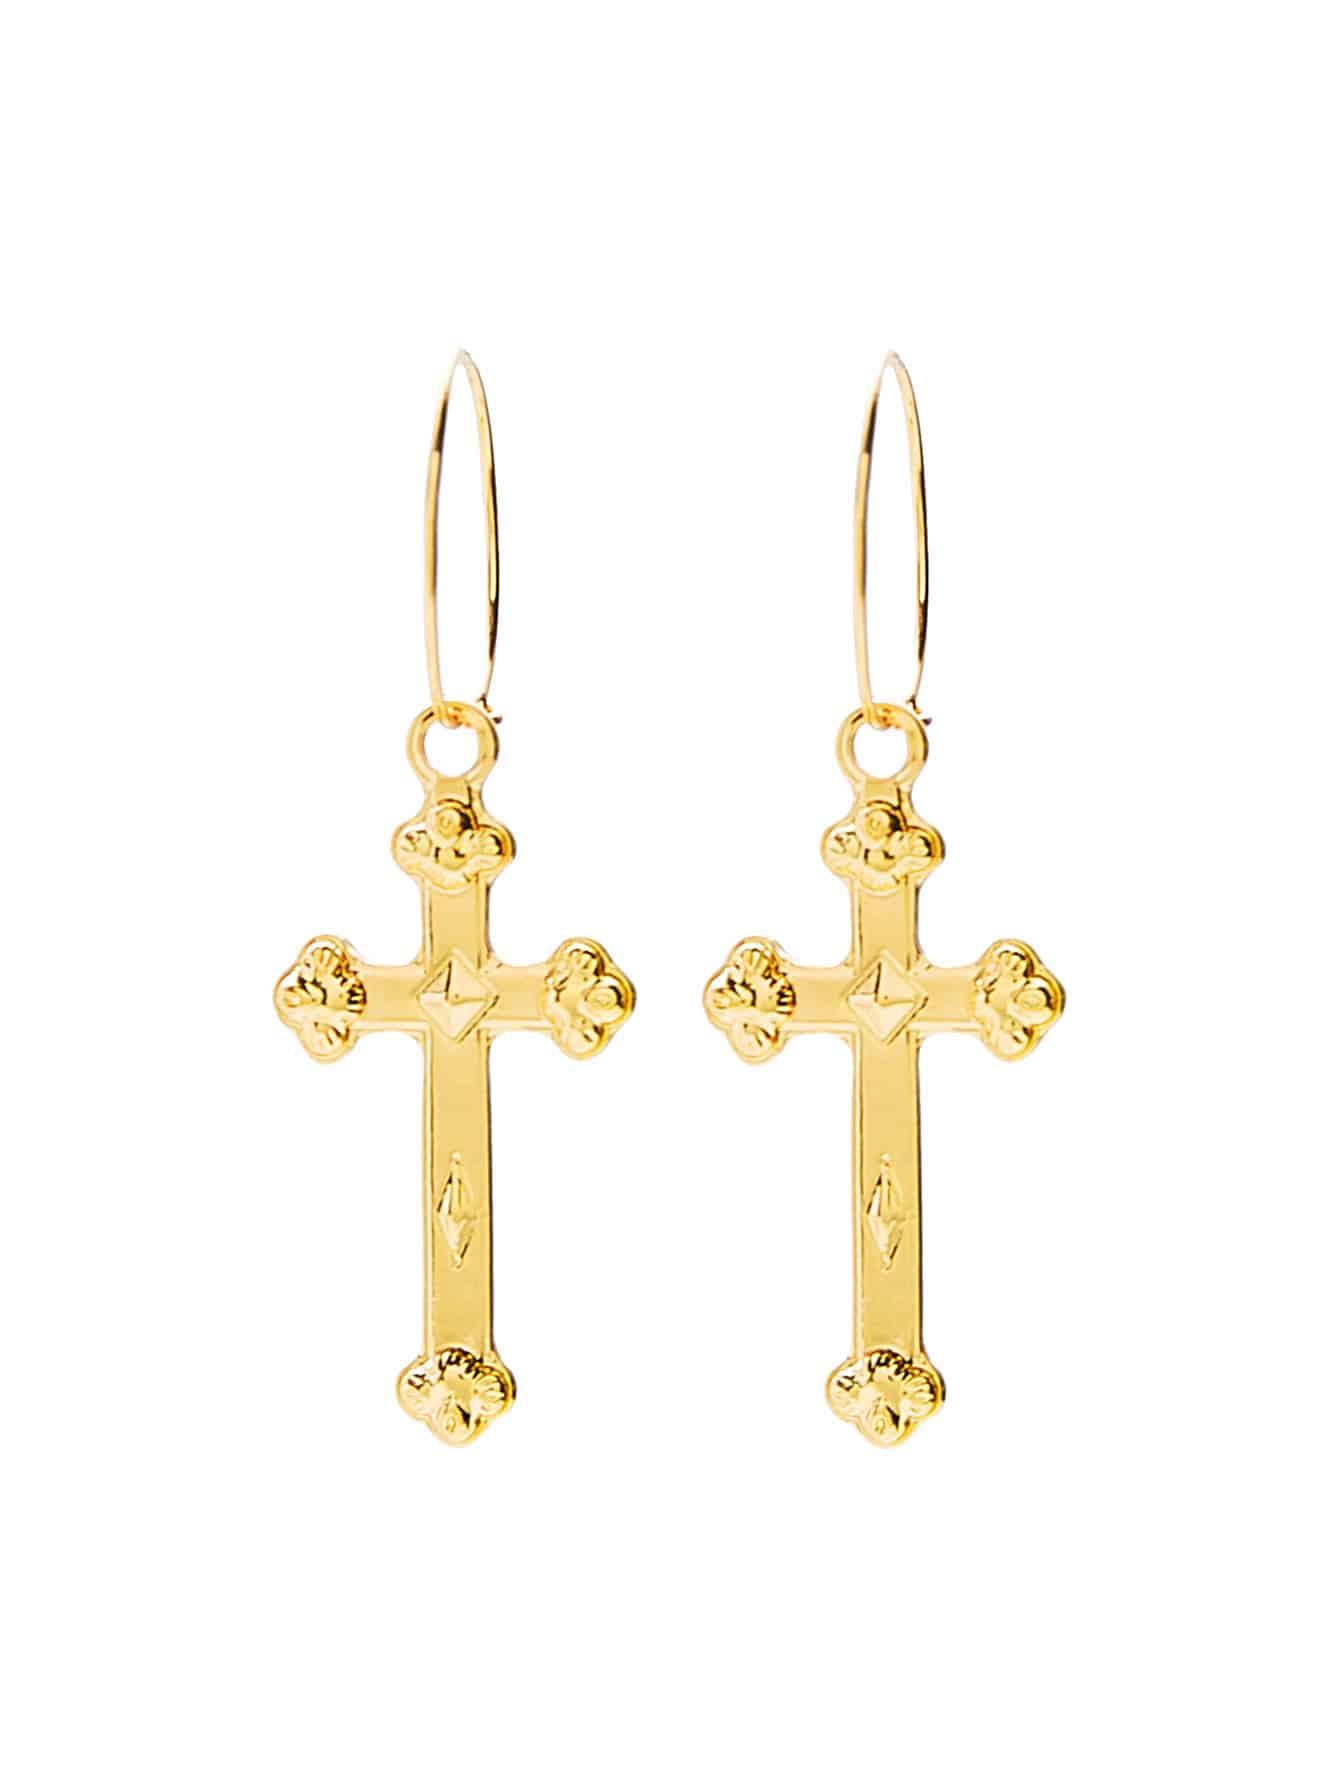 Metal Cross Drop Earrings two tone metal drop earrings